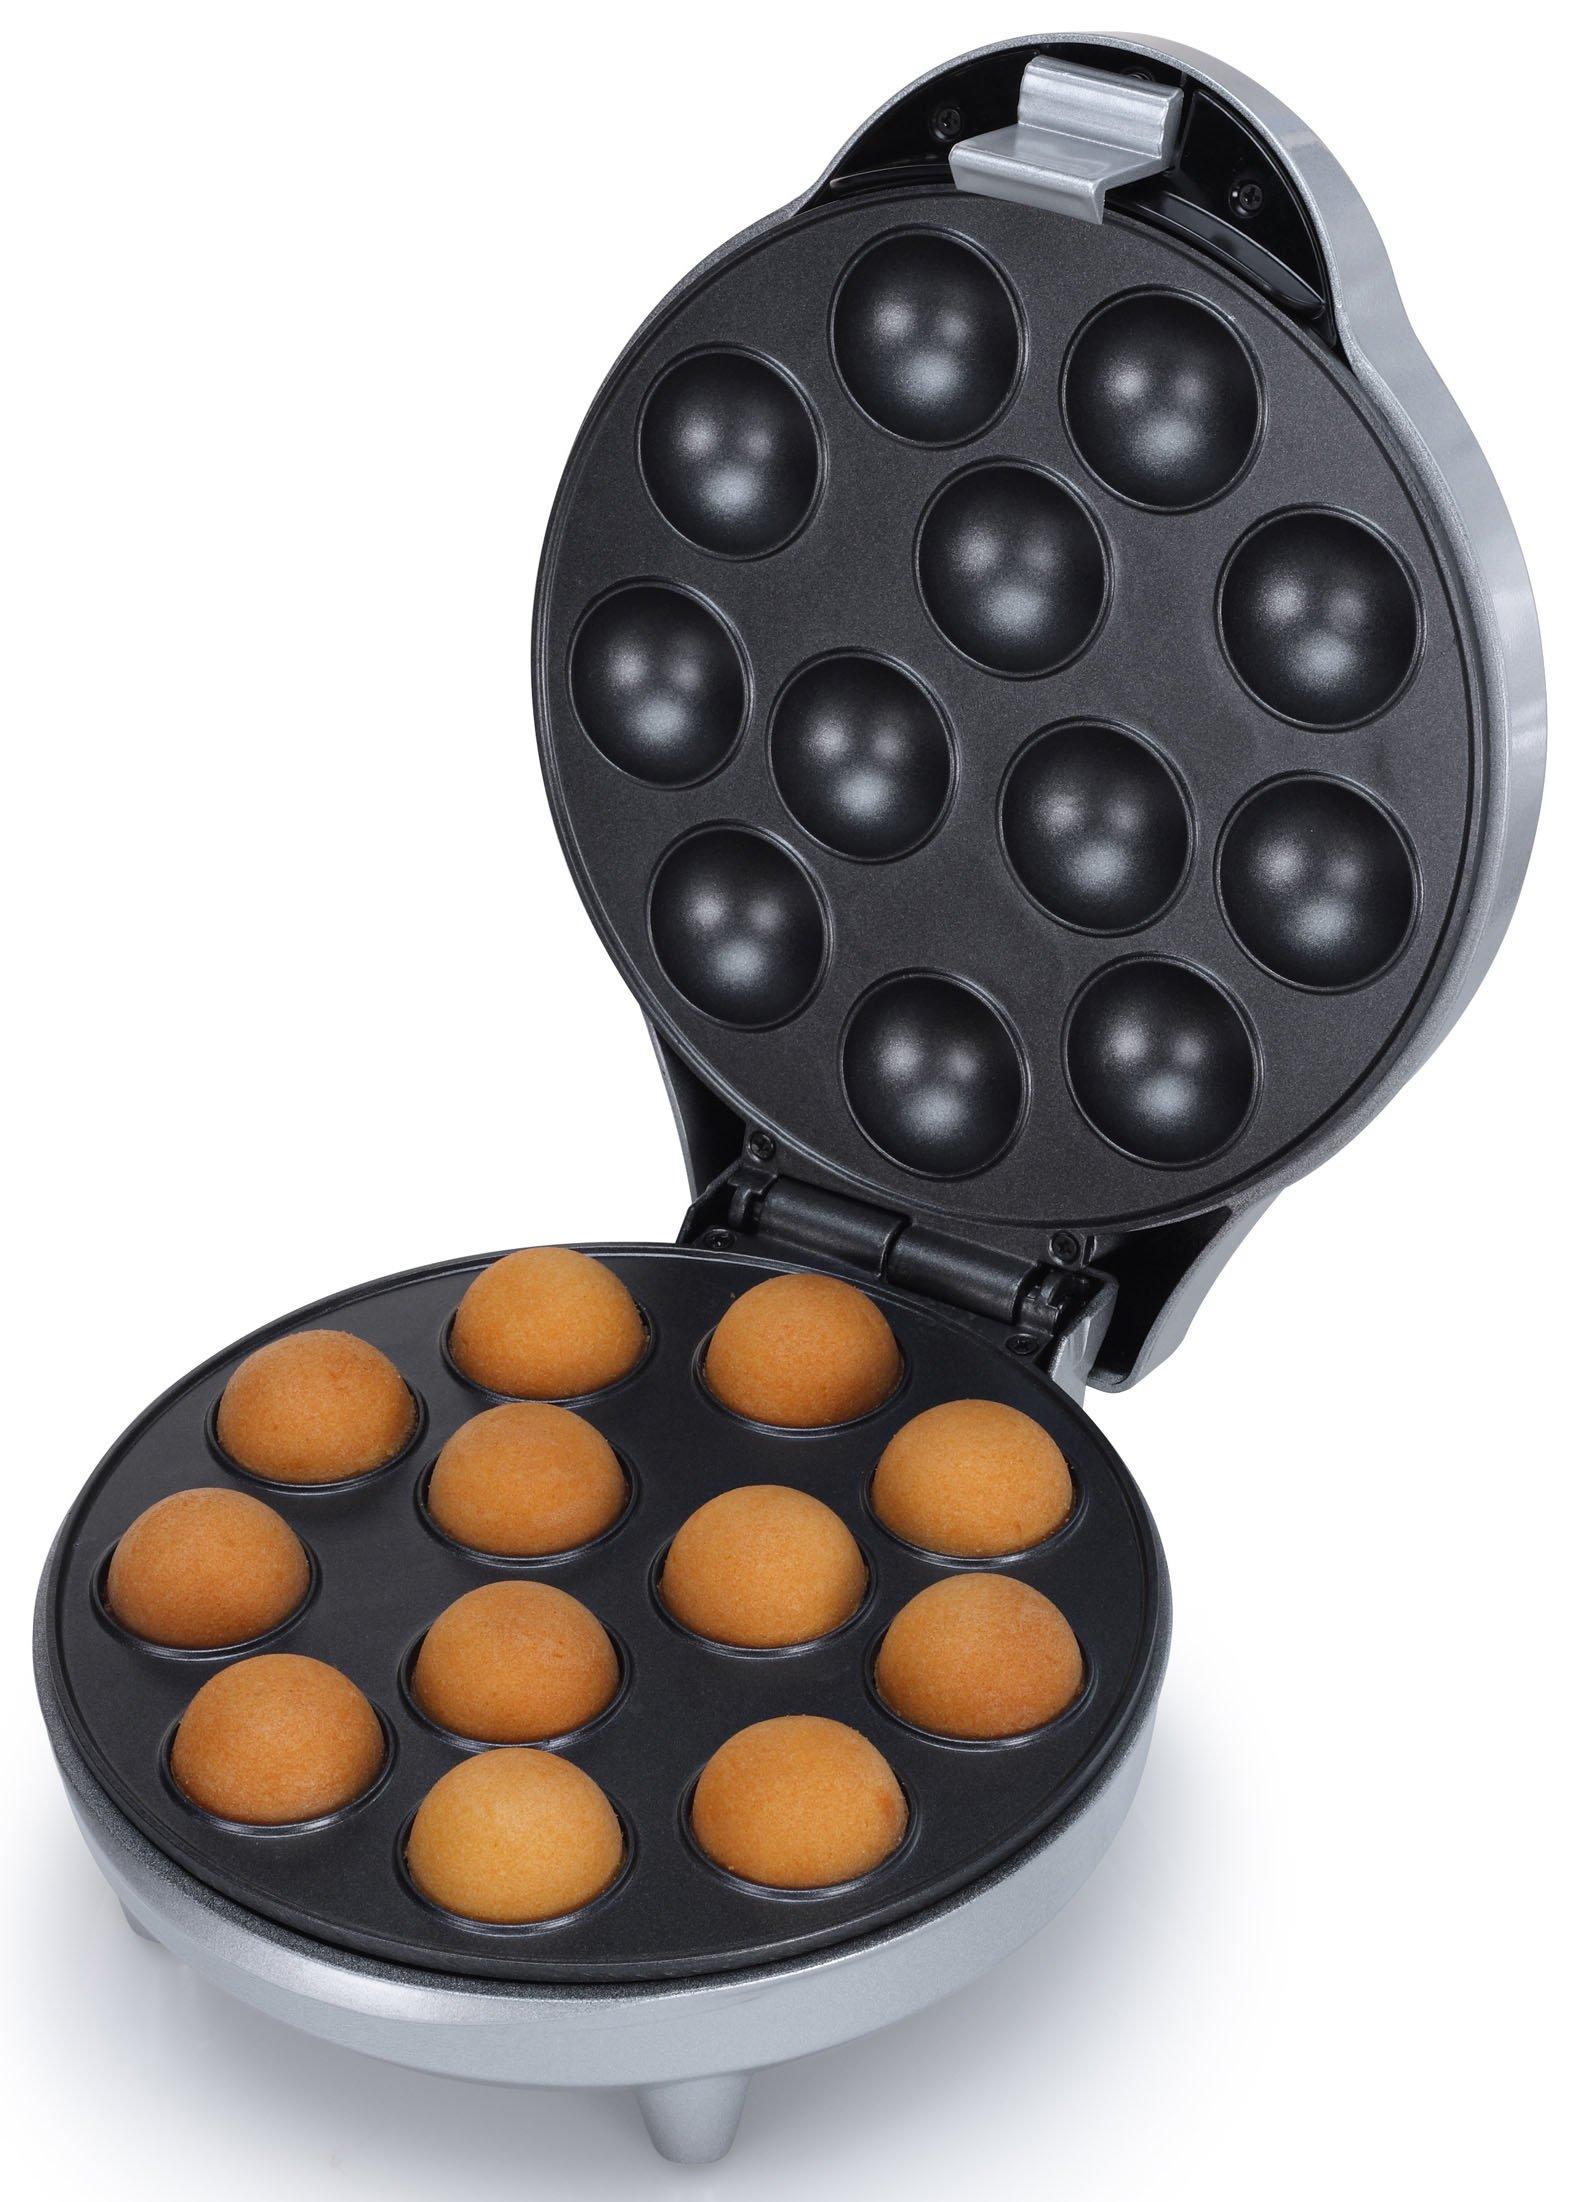 Tristar SA-1123 Cake-Pop Maker – 12 Portionen gleichzeitig – Antihaftbeschichtung product image